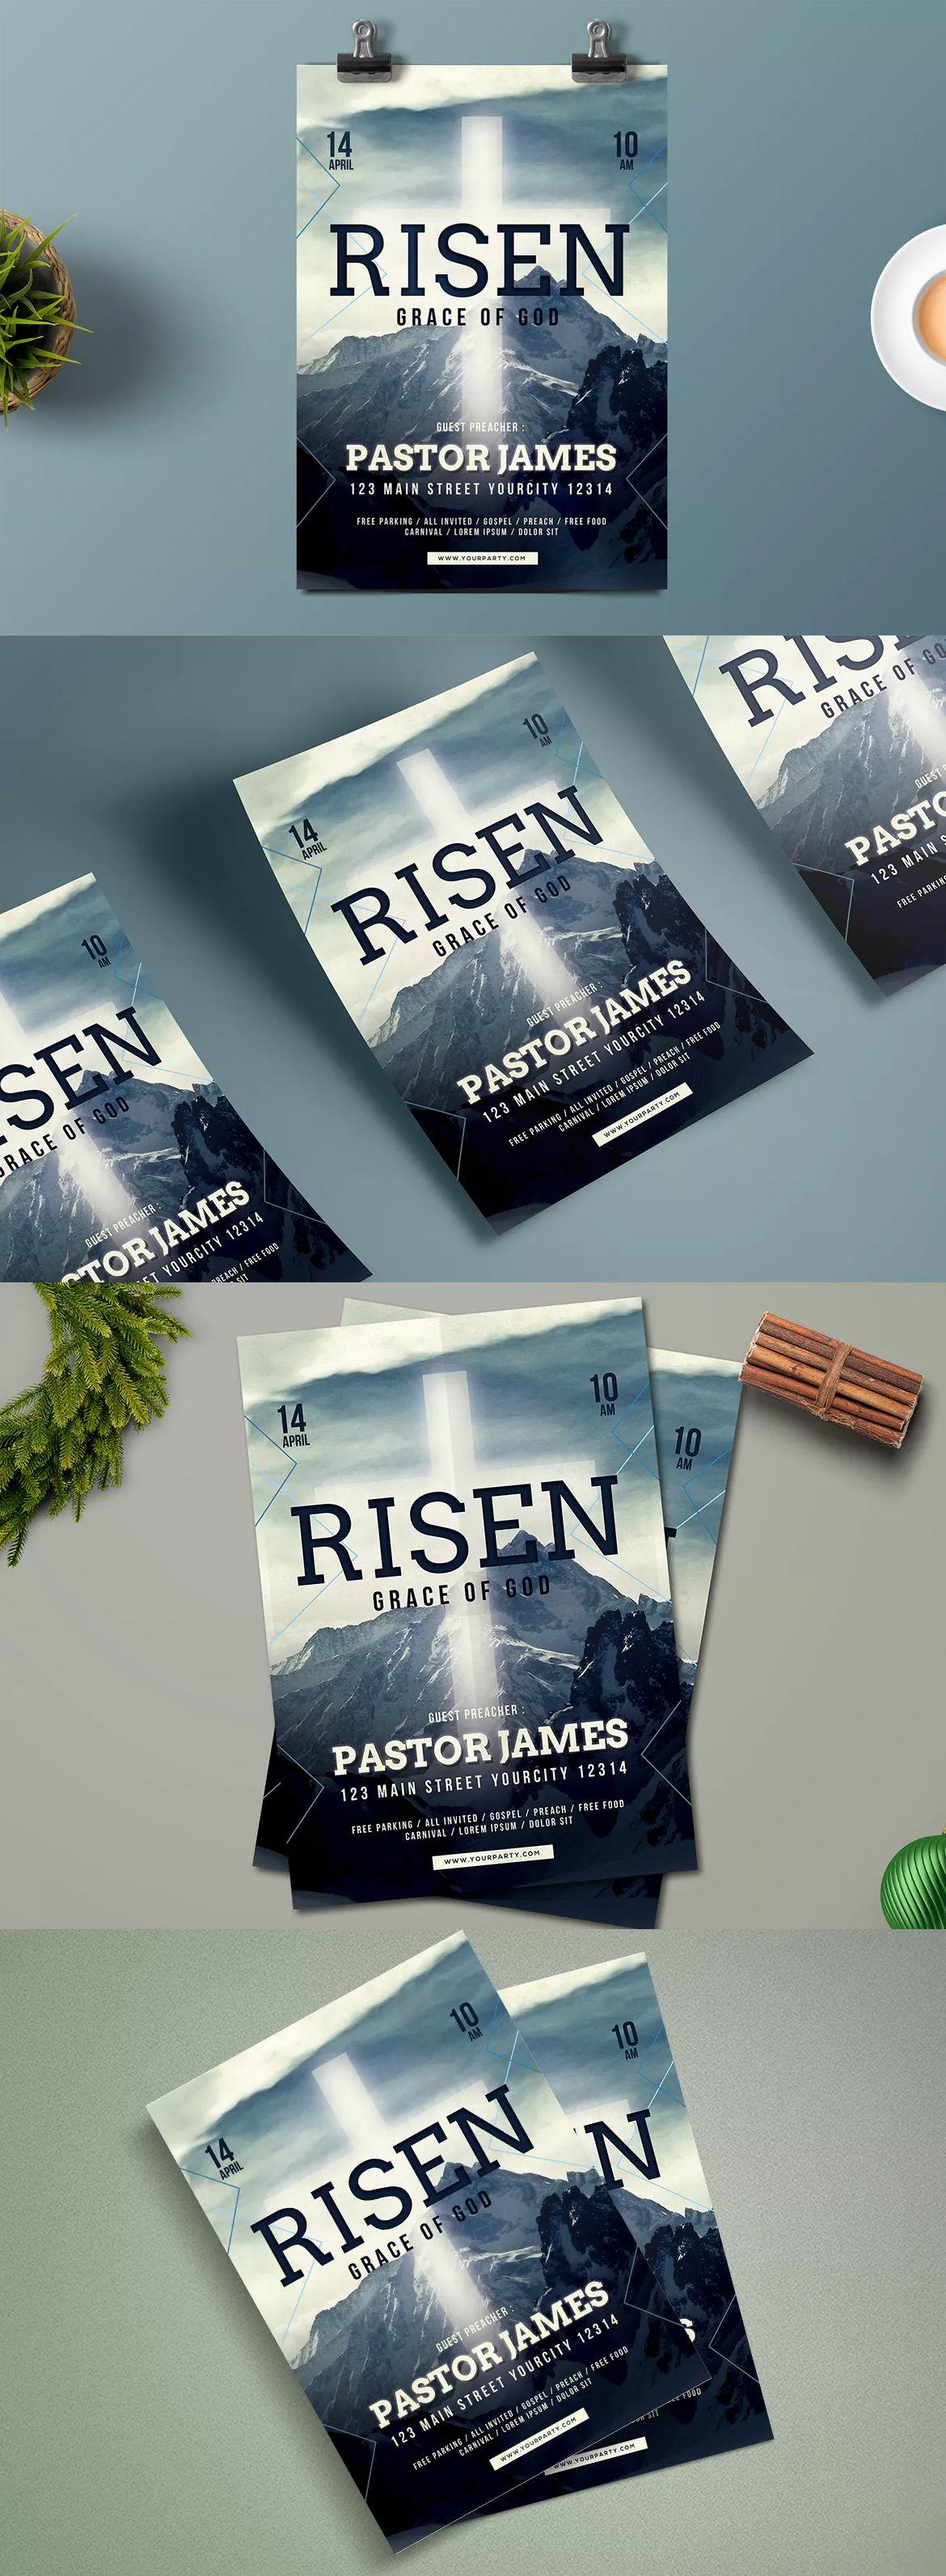 Easter Church Flyer Template Psd Flyer Design Templates